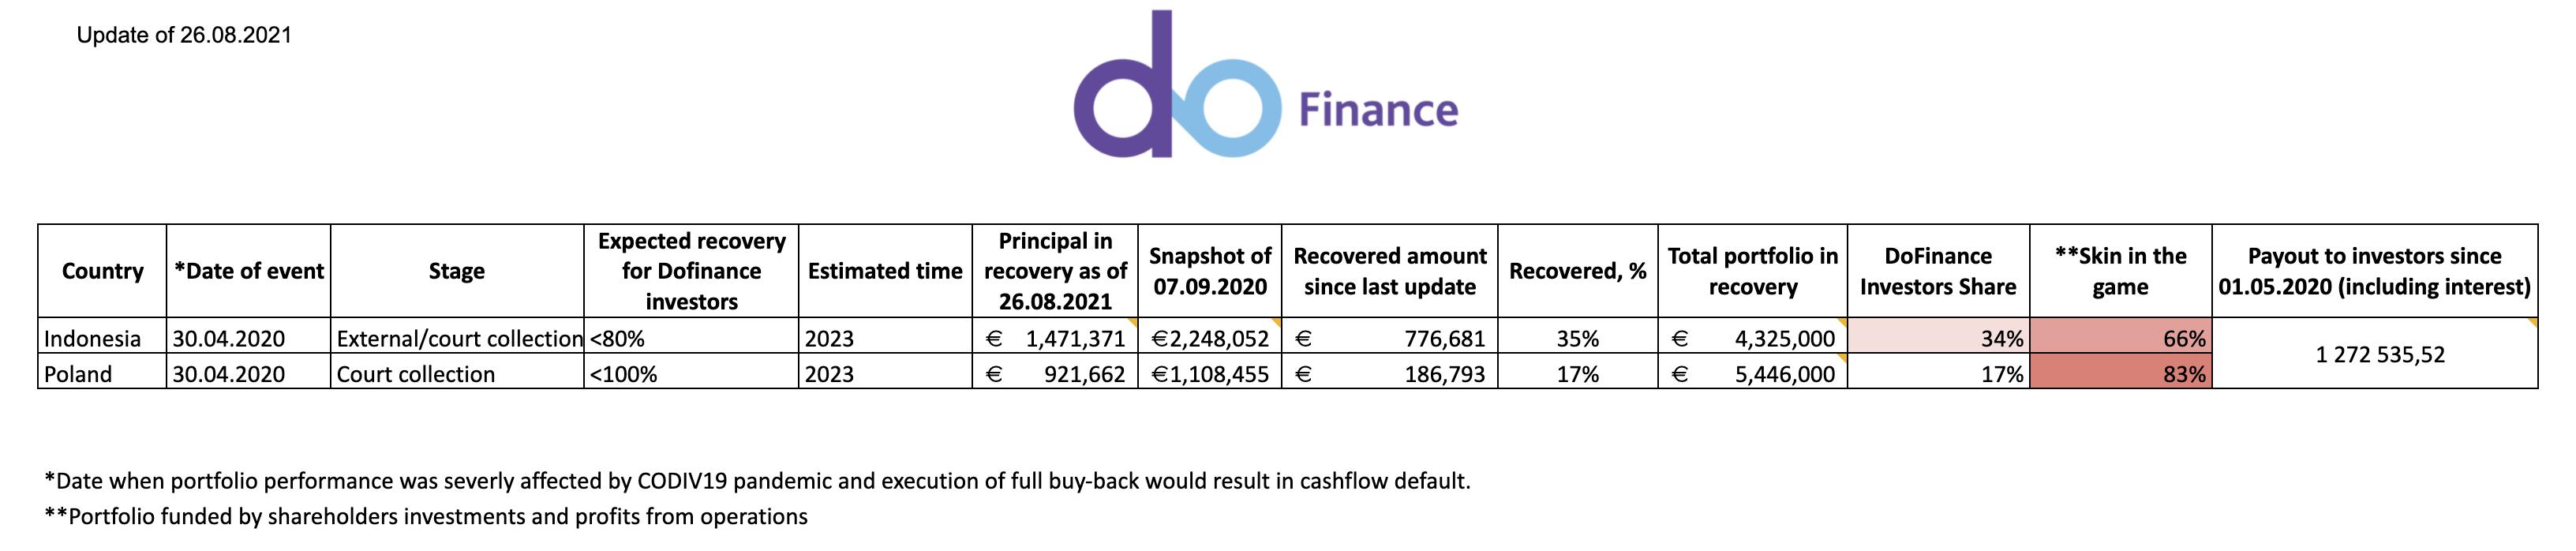 dofinance_status_update_on_recovery_26.08.2021